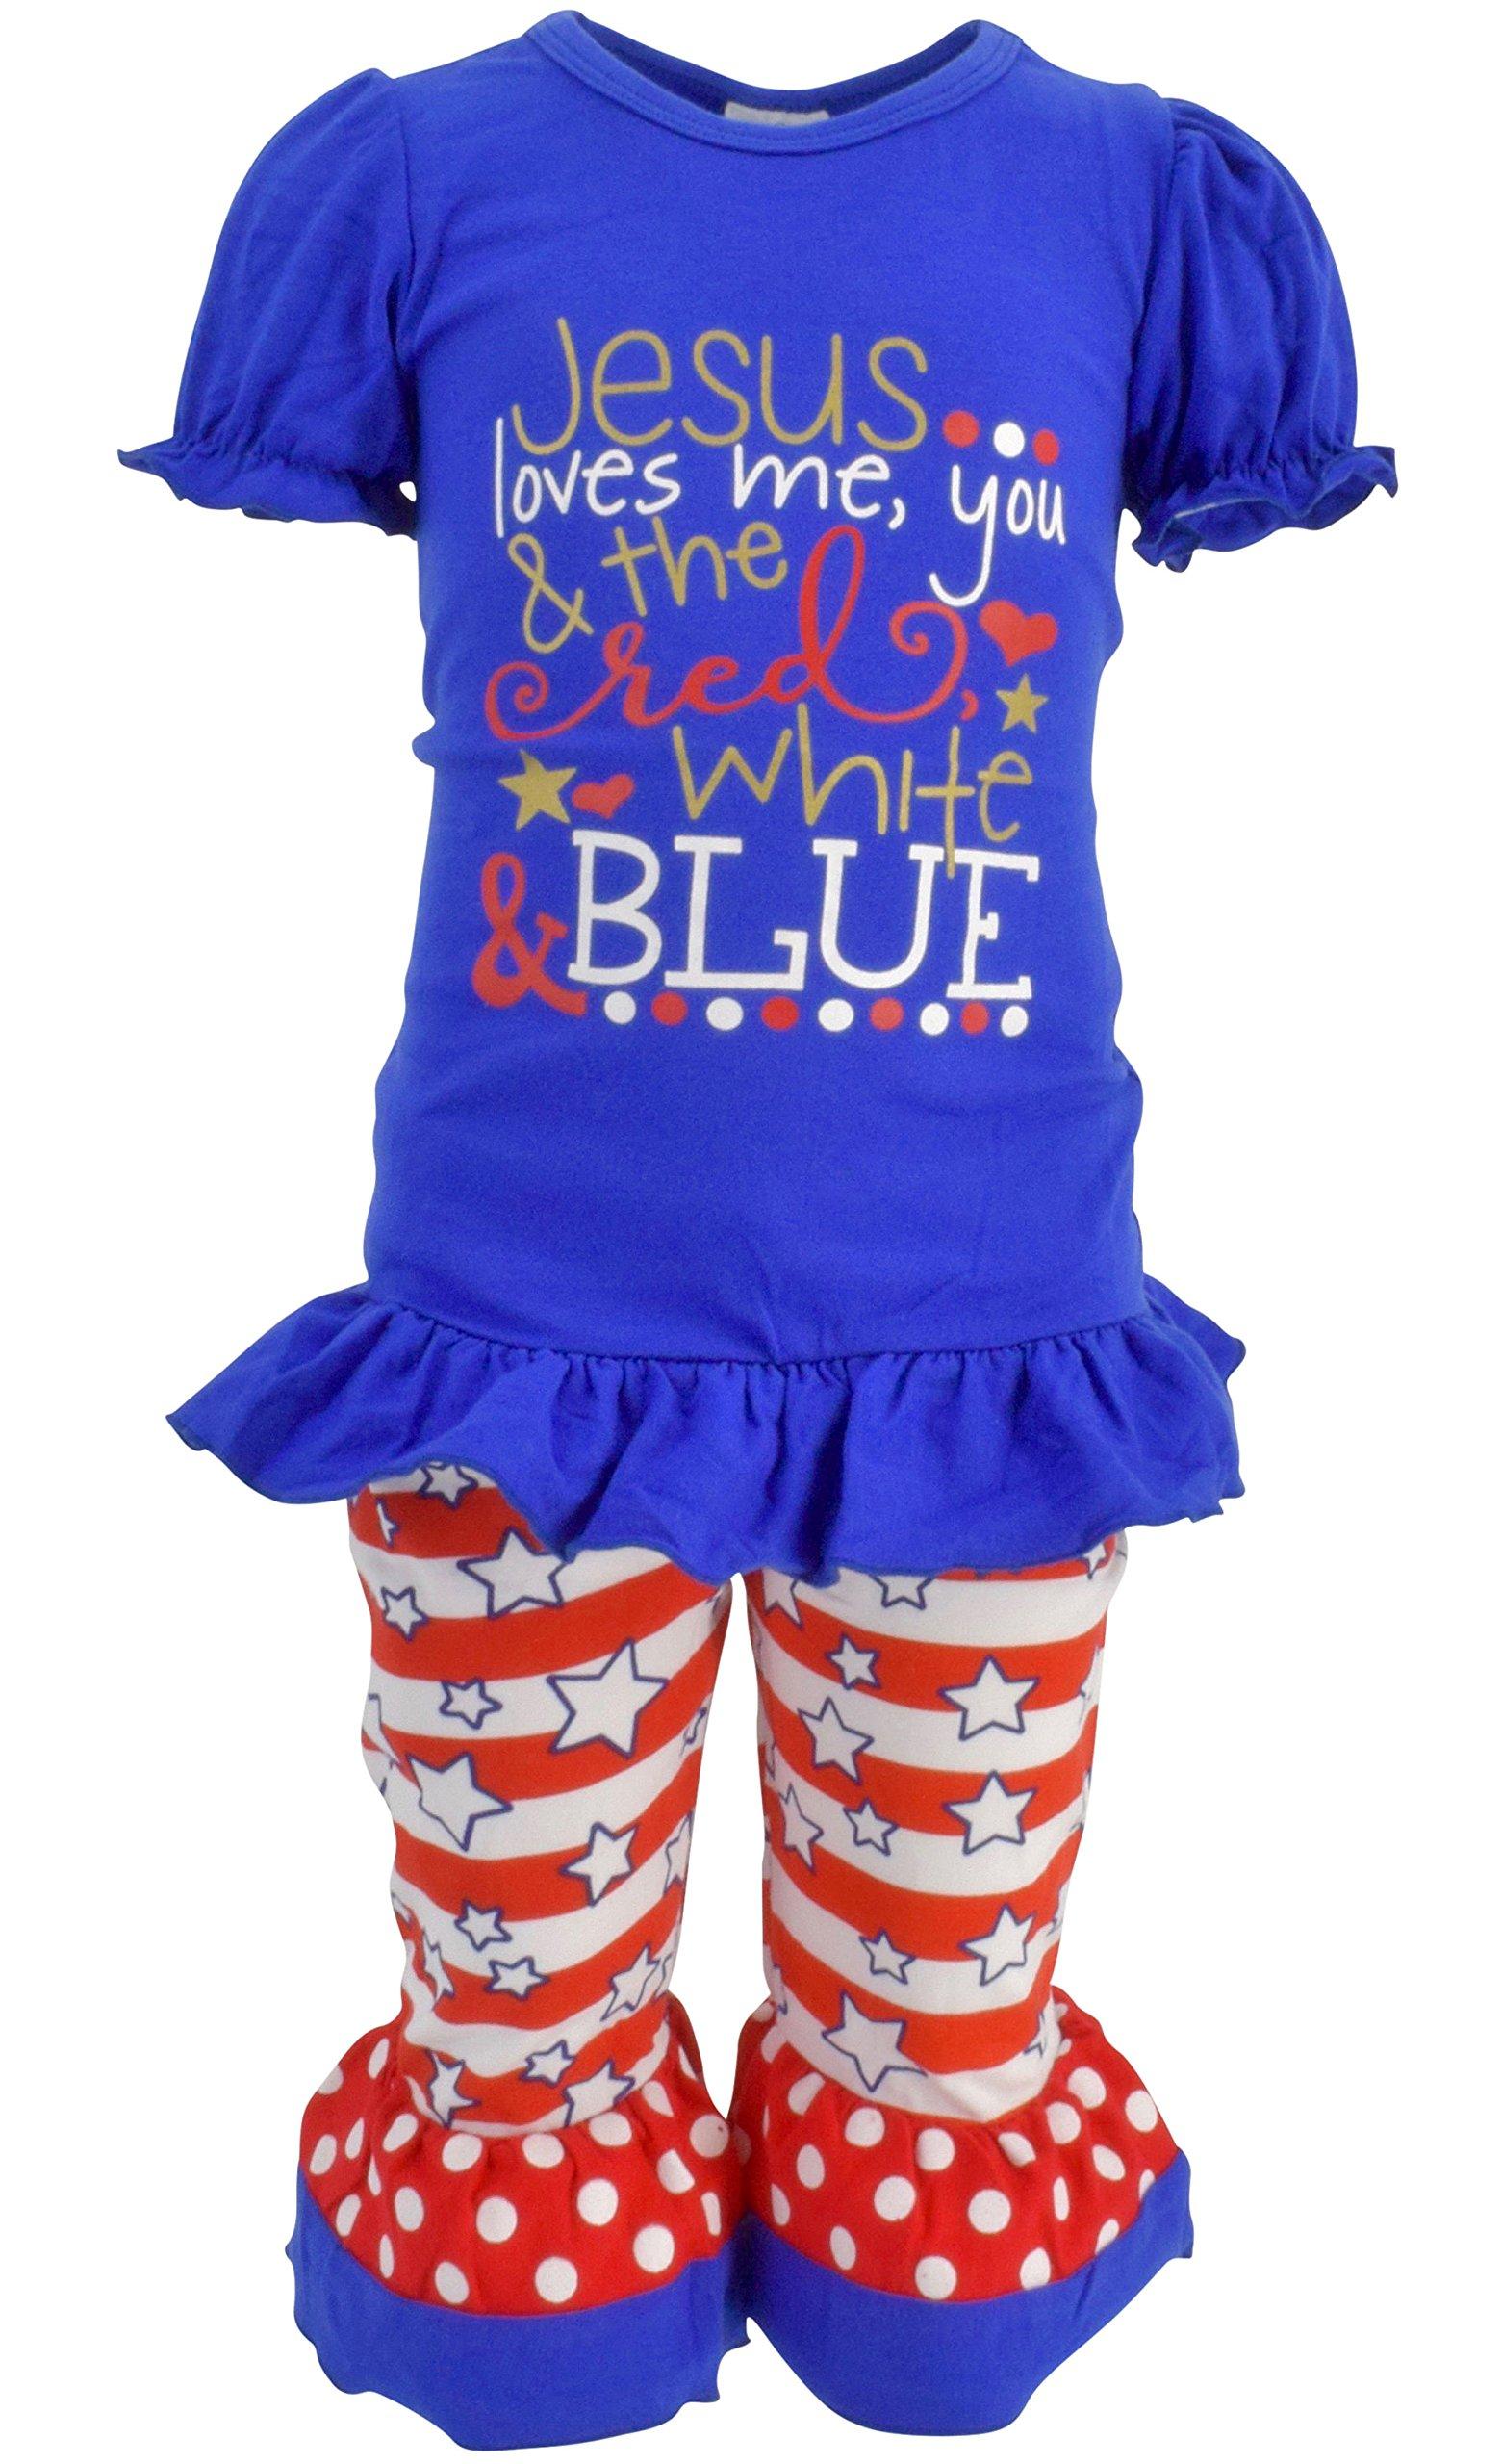 Unique Baby Girls Jesus Love Me 4th of July Boutique Outfit (5T/L, Blue)